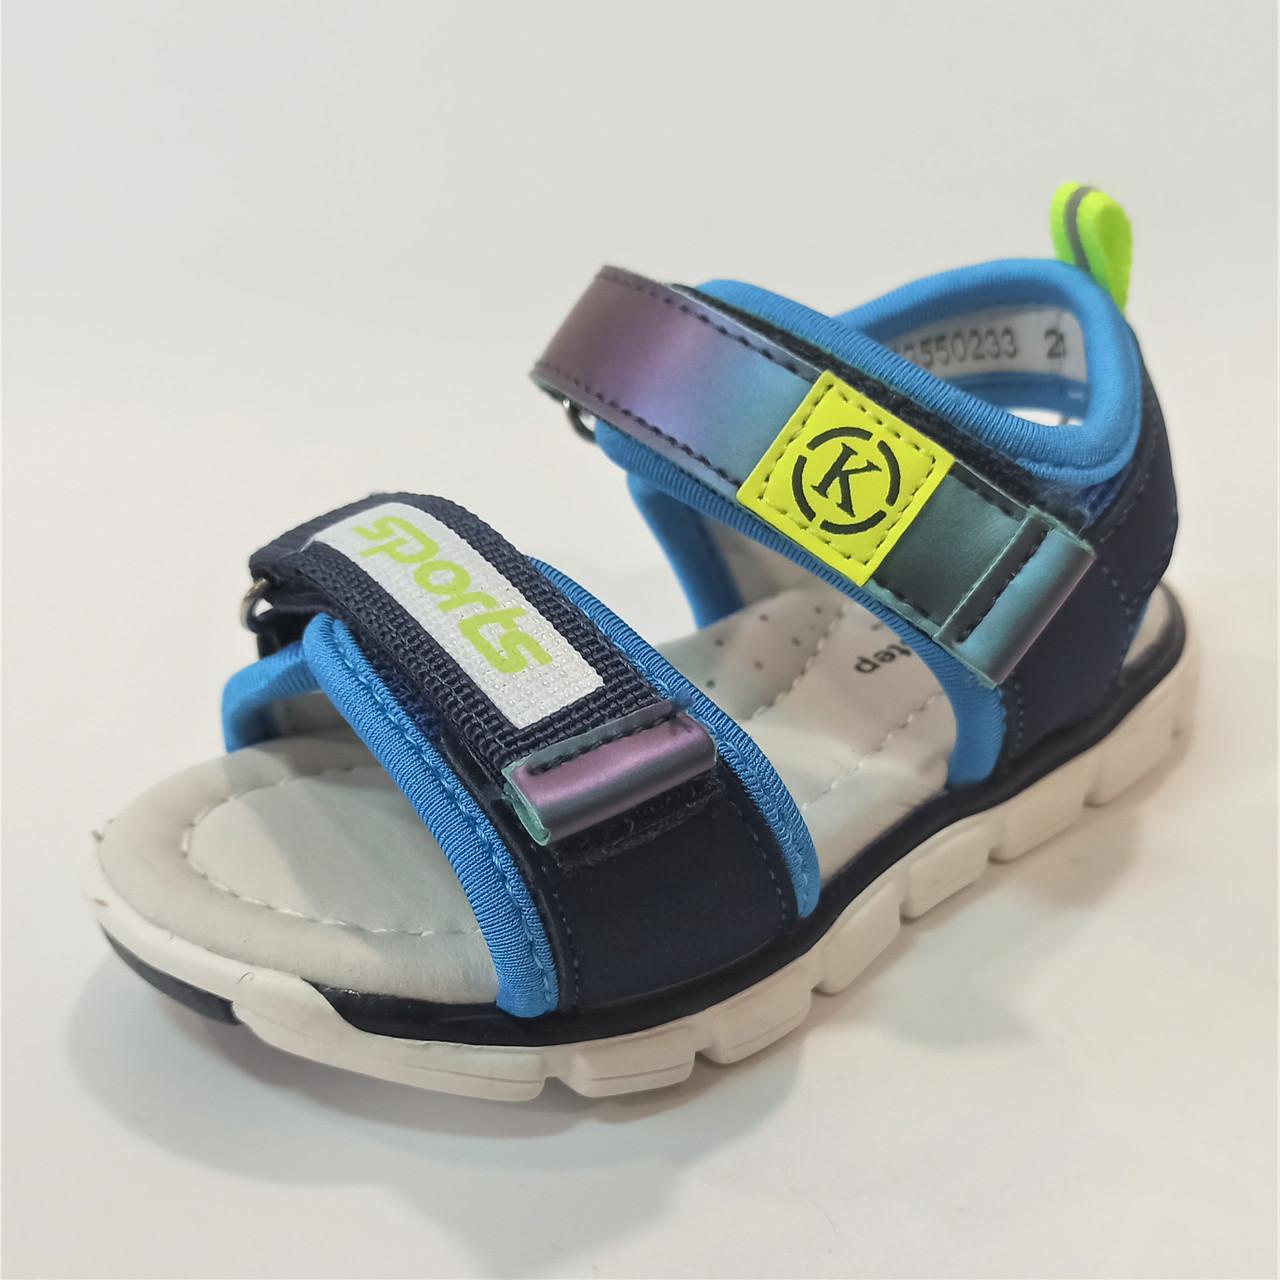 Открытые сандалии на малыша, Weеstep размеры: 21-26